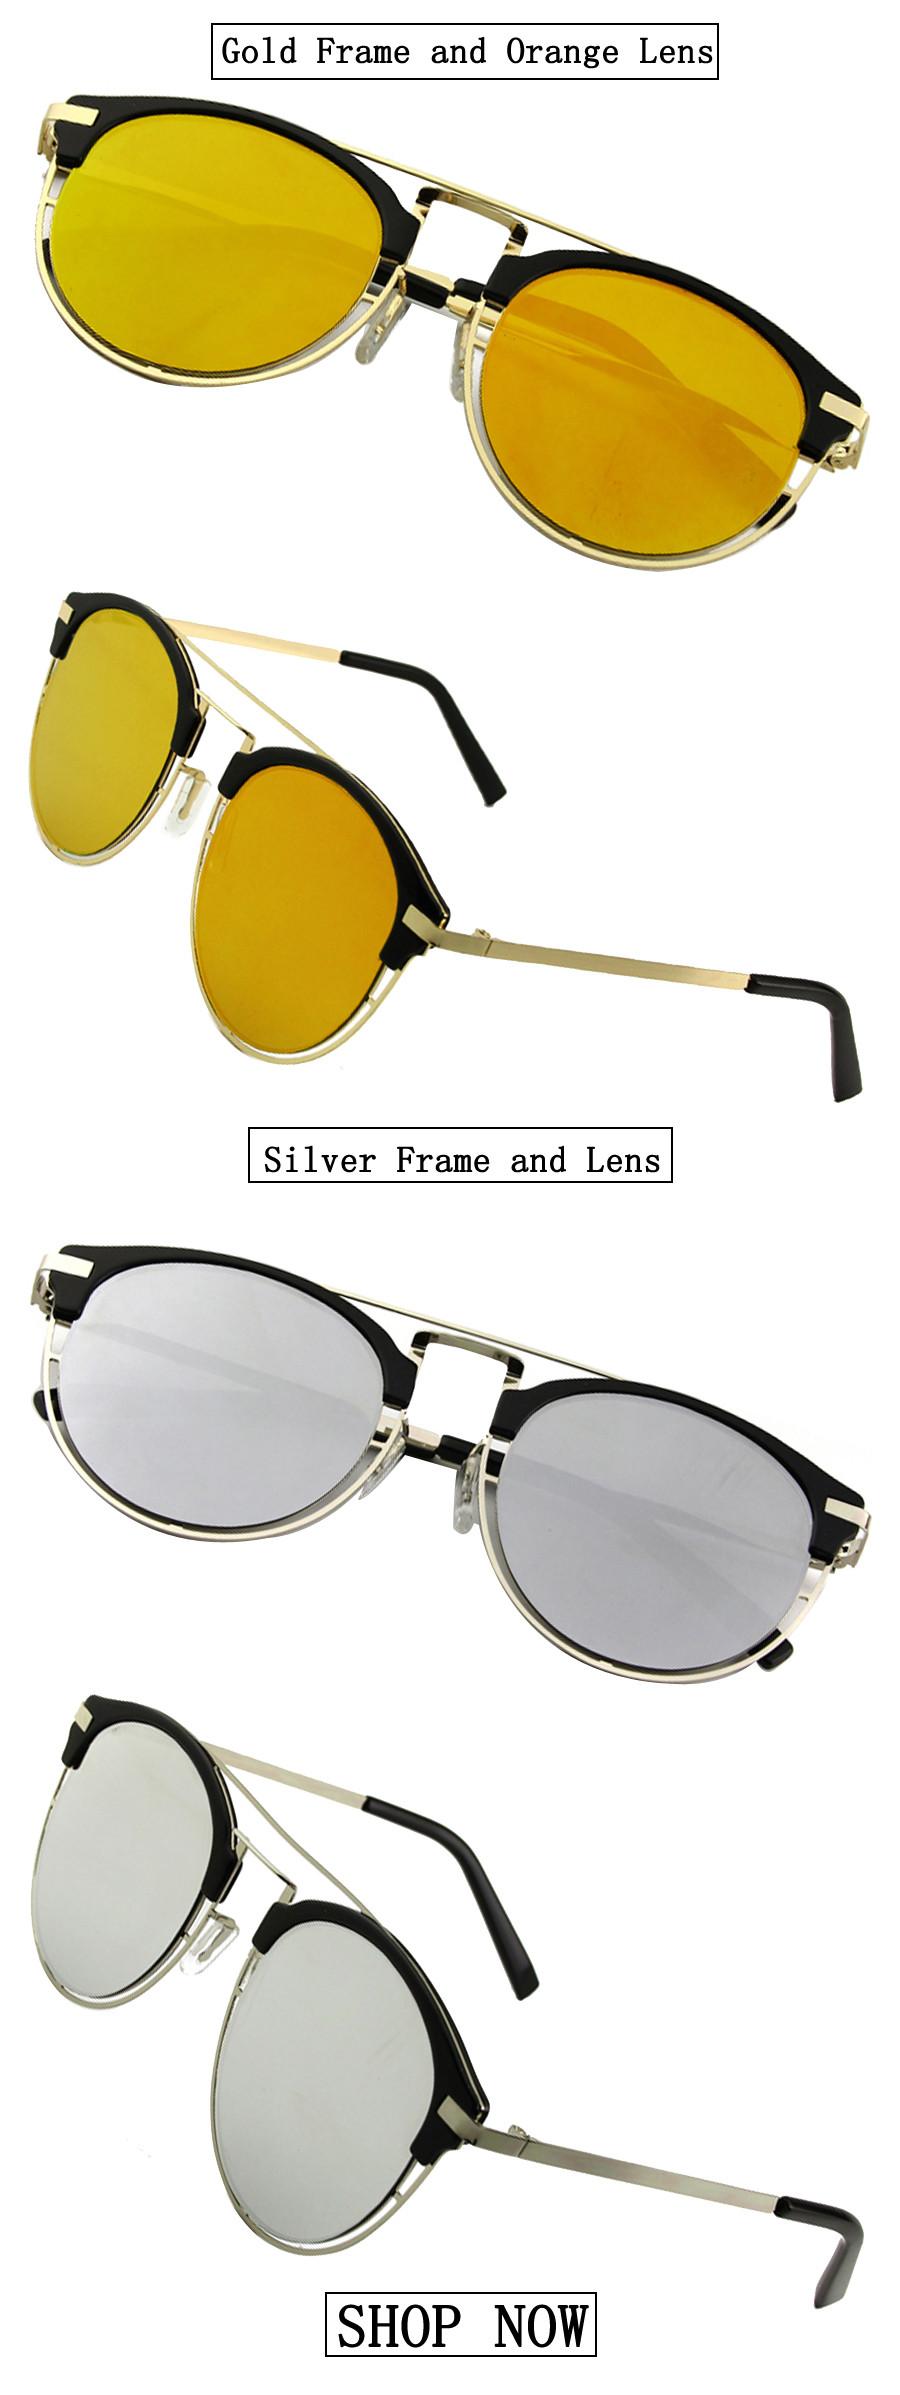 SGS6566-Sunglasses Display02